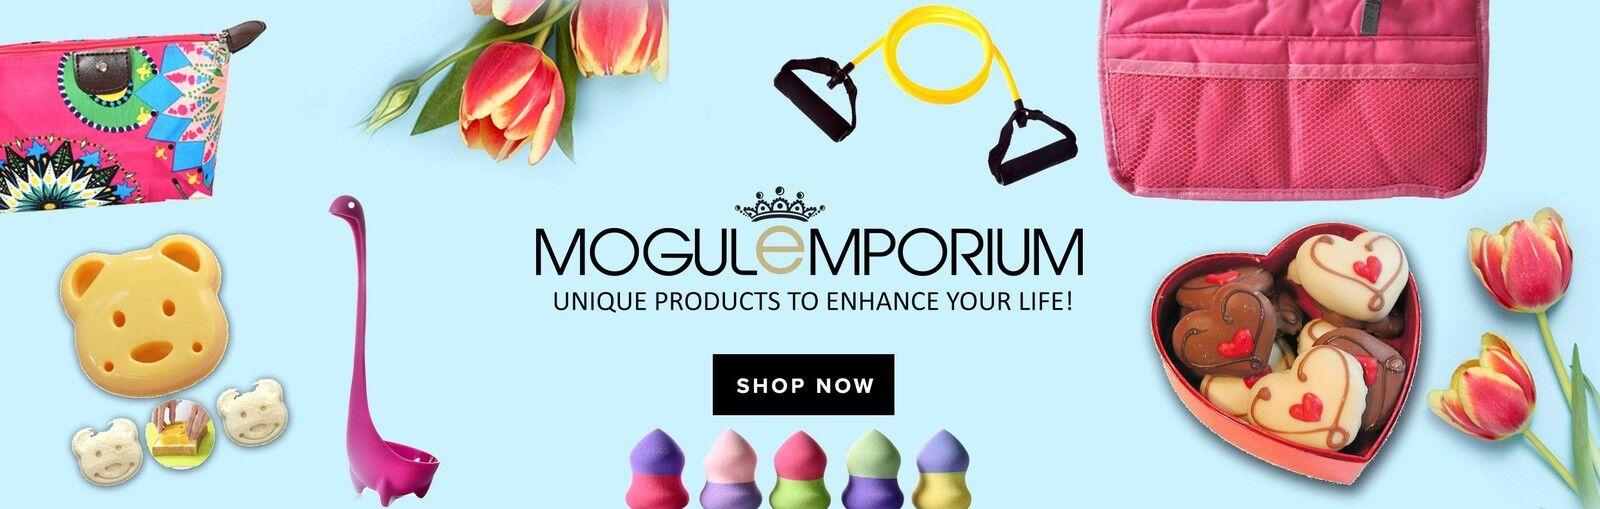 Mogul Shop